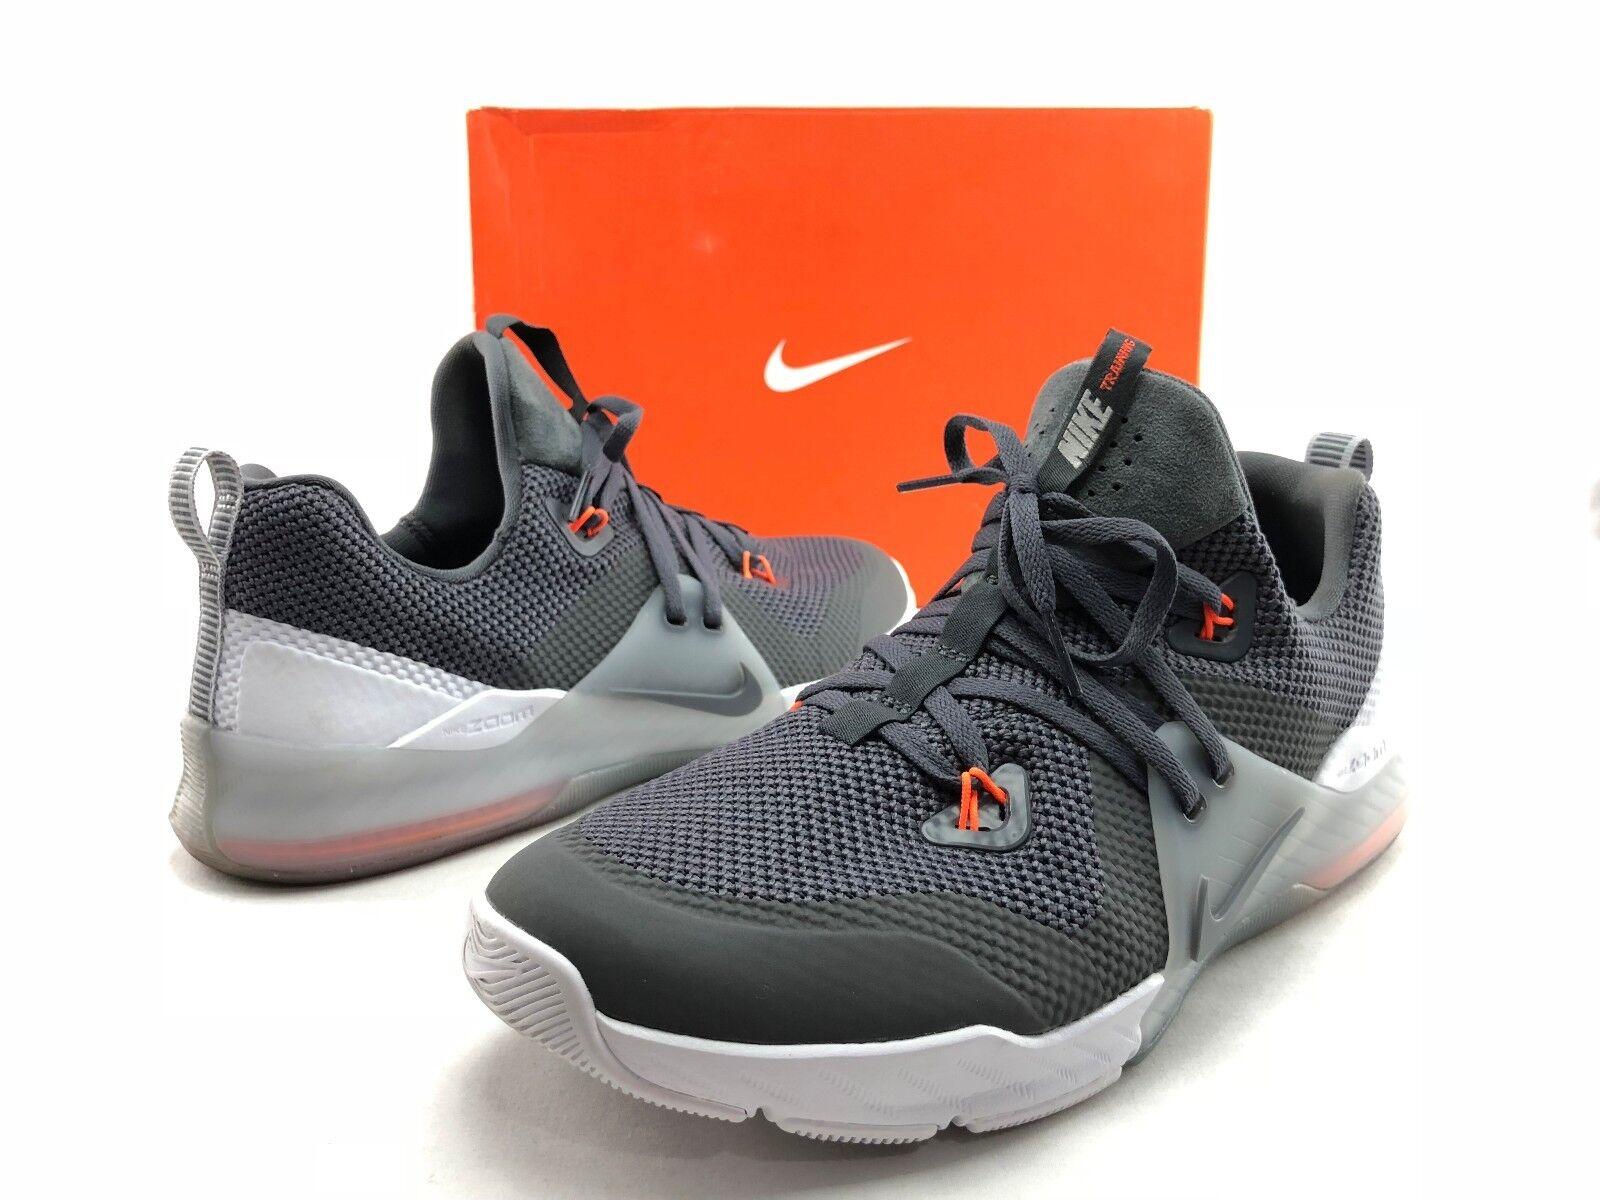 2064679f1e55 Nike Zoom Train Command Men s Grey orange Athletic Training shoes shoes  shoes US 10 C244 8f8636